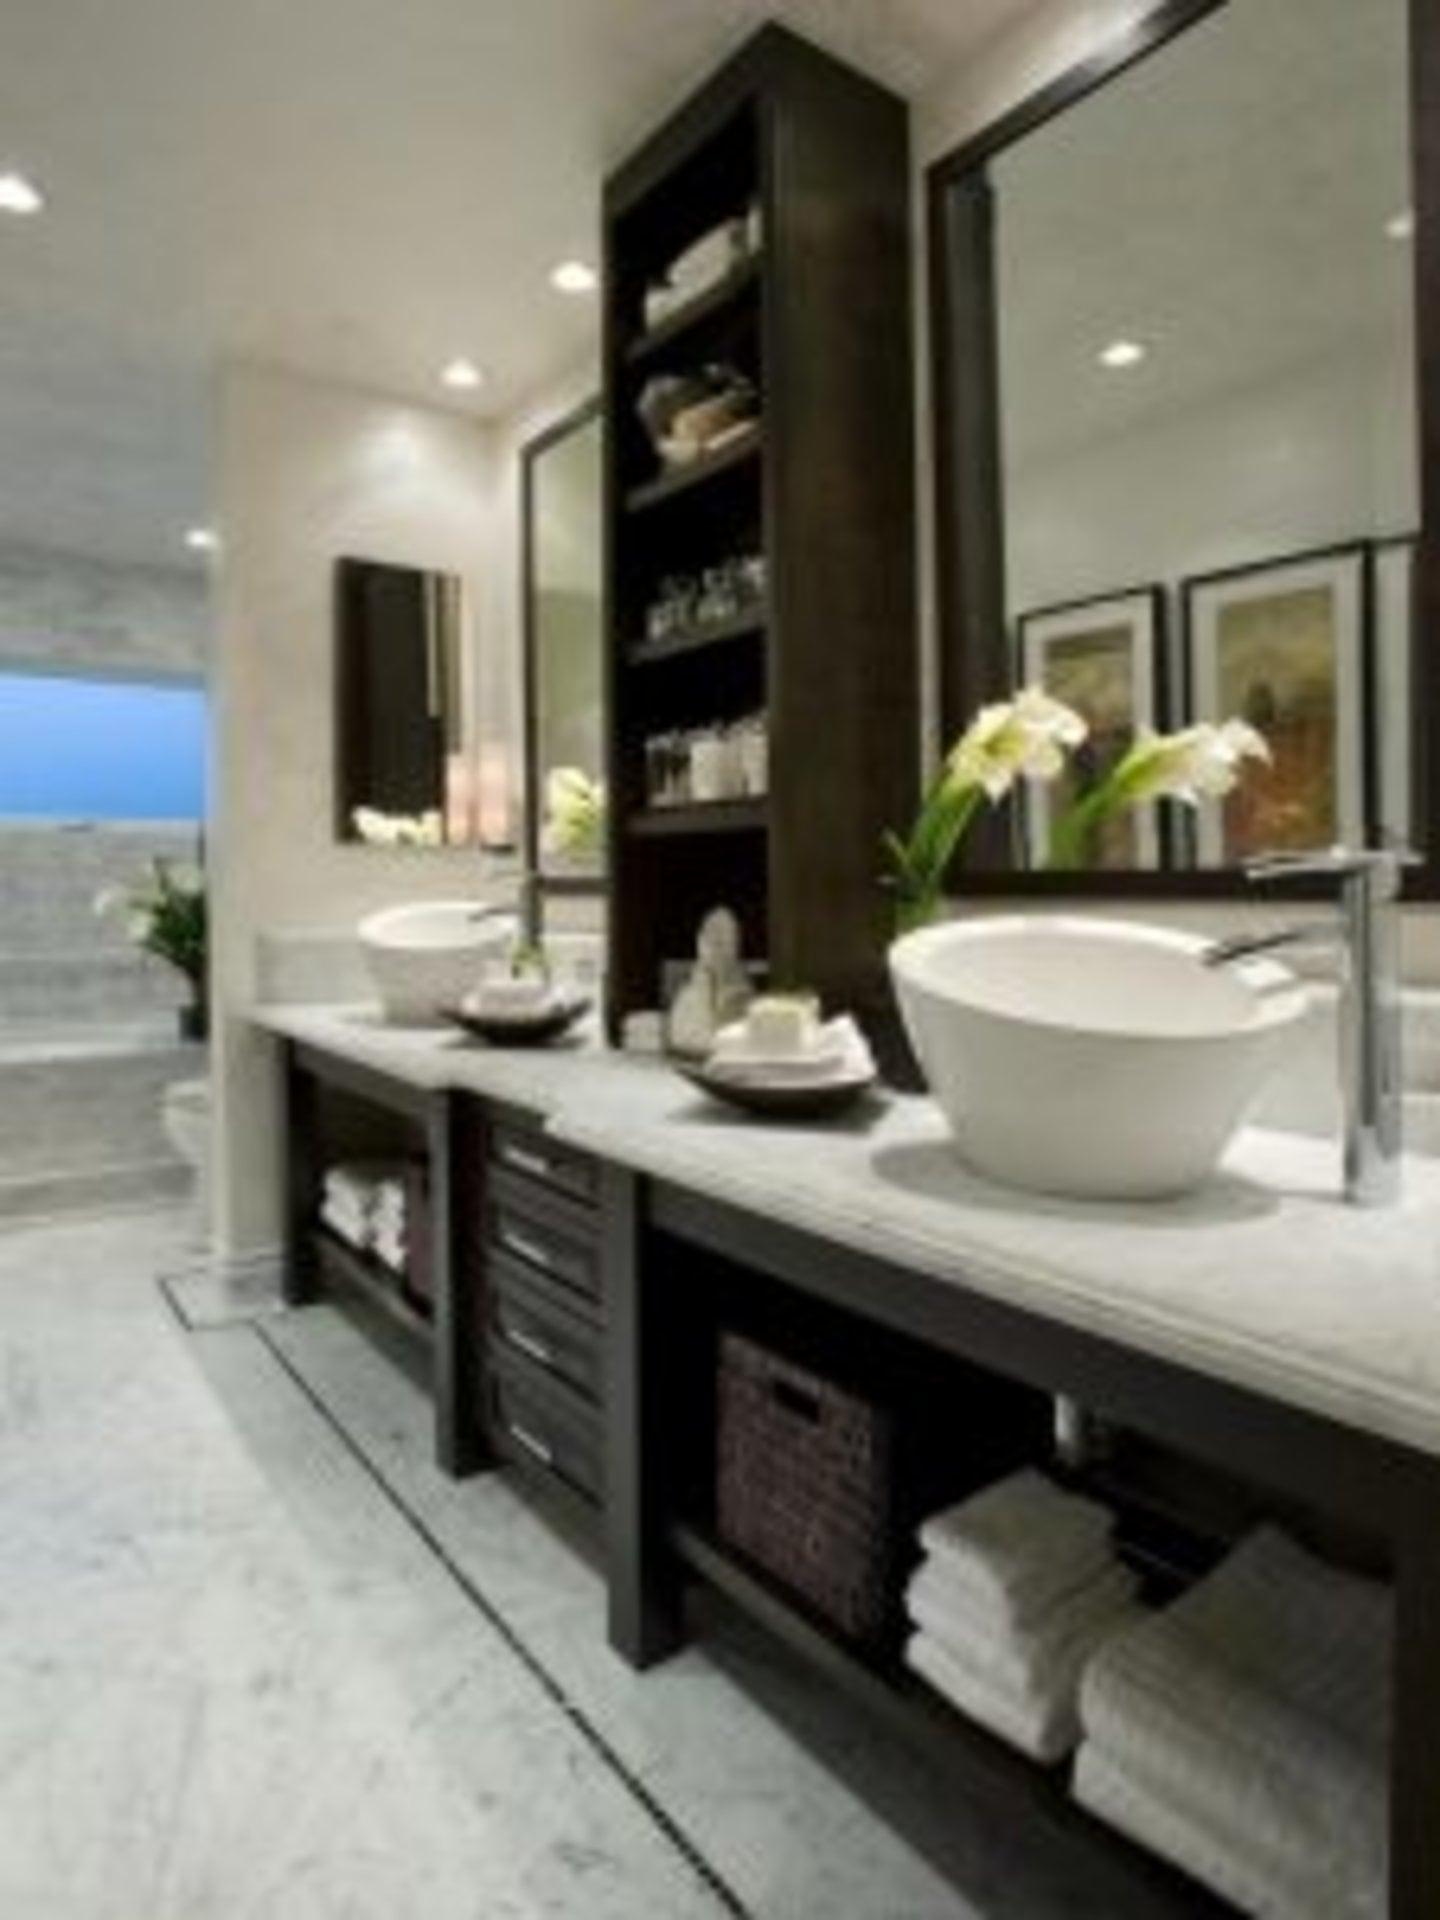 WAM Interiors bathroom vanity vessel sink